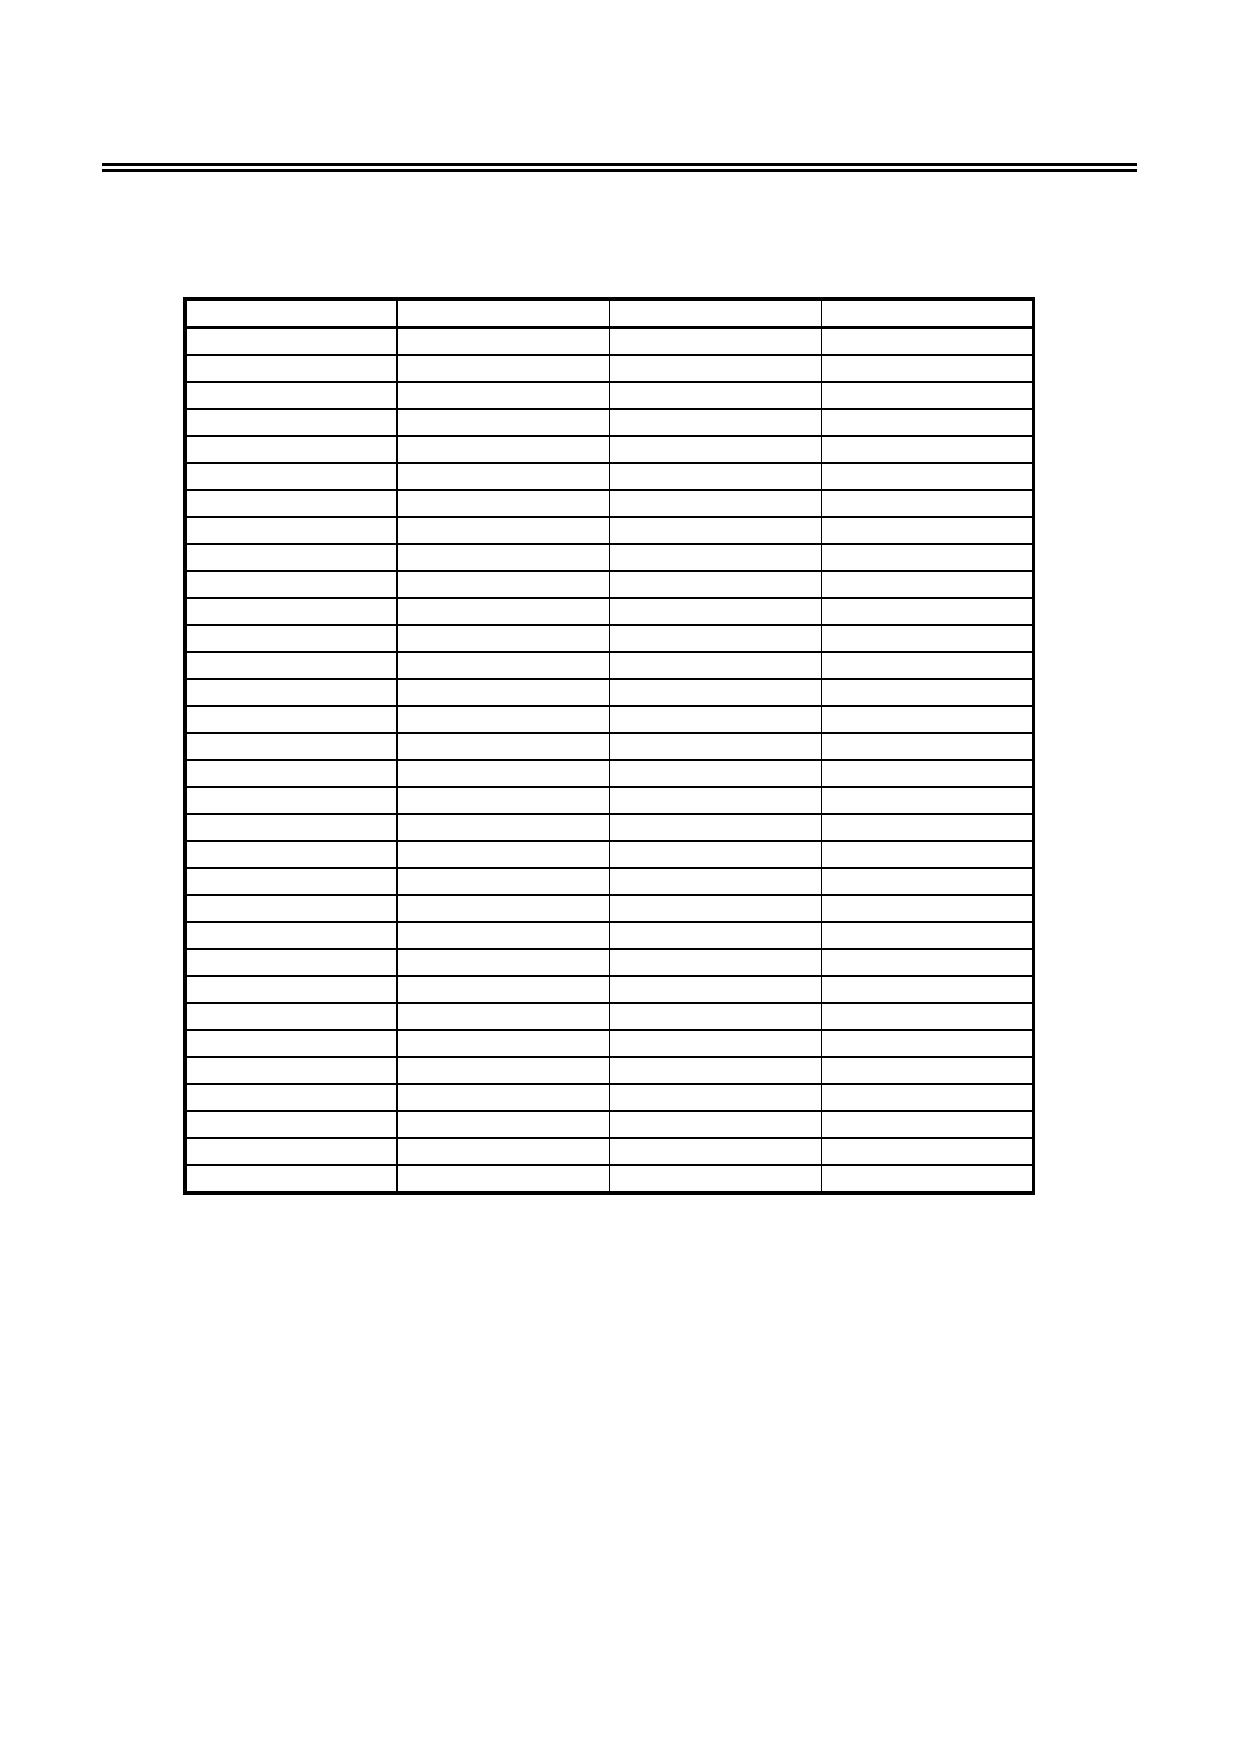 S-1000 pdf, 반도체, 판매, 대치품